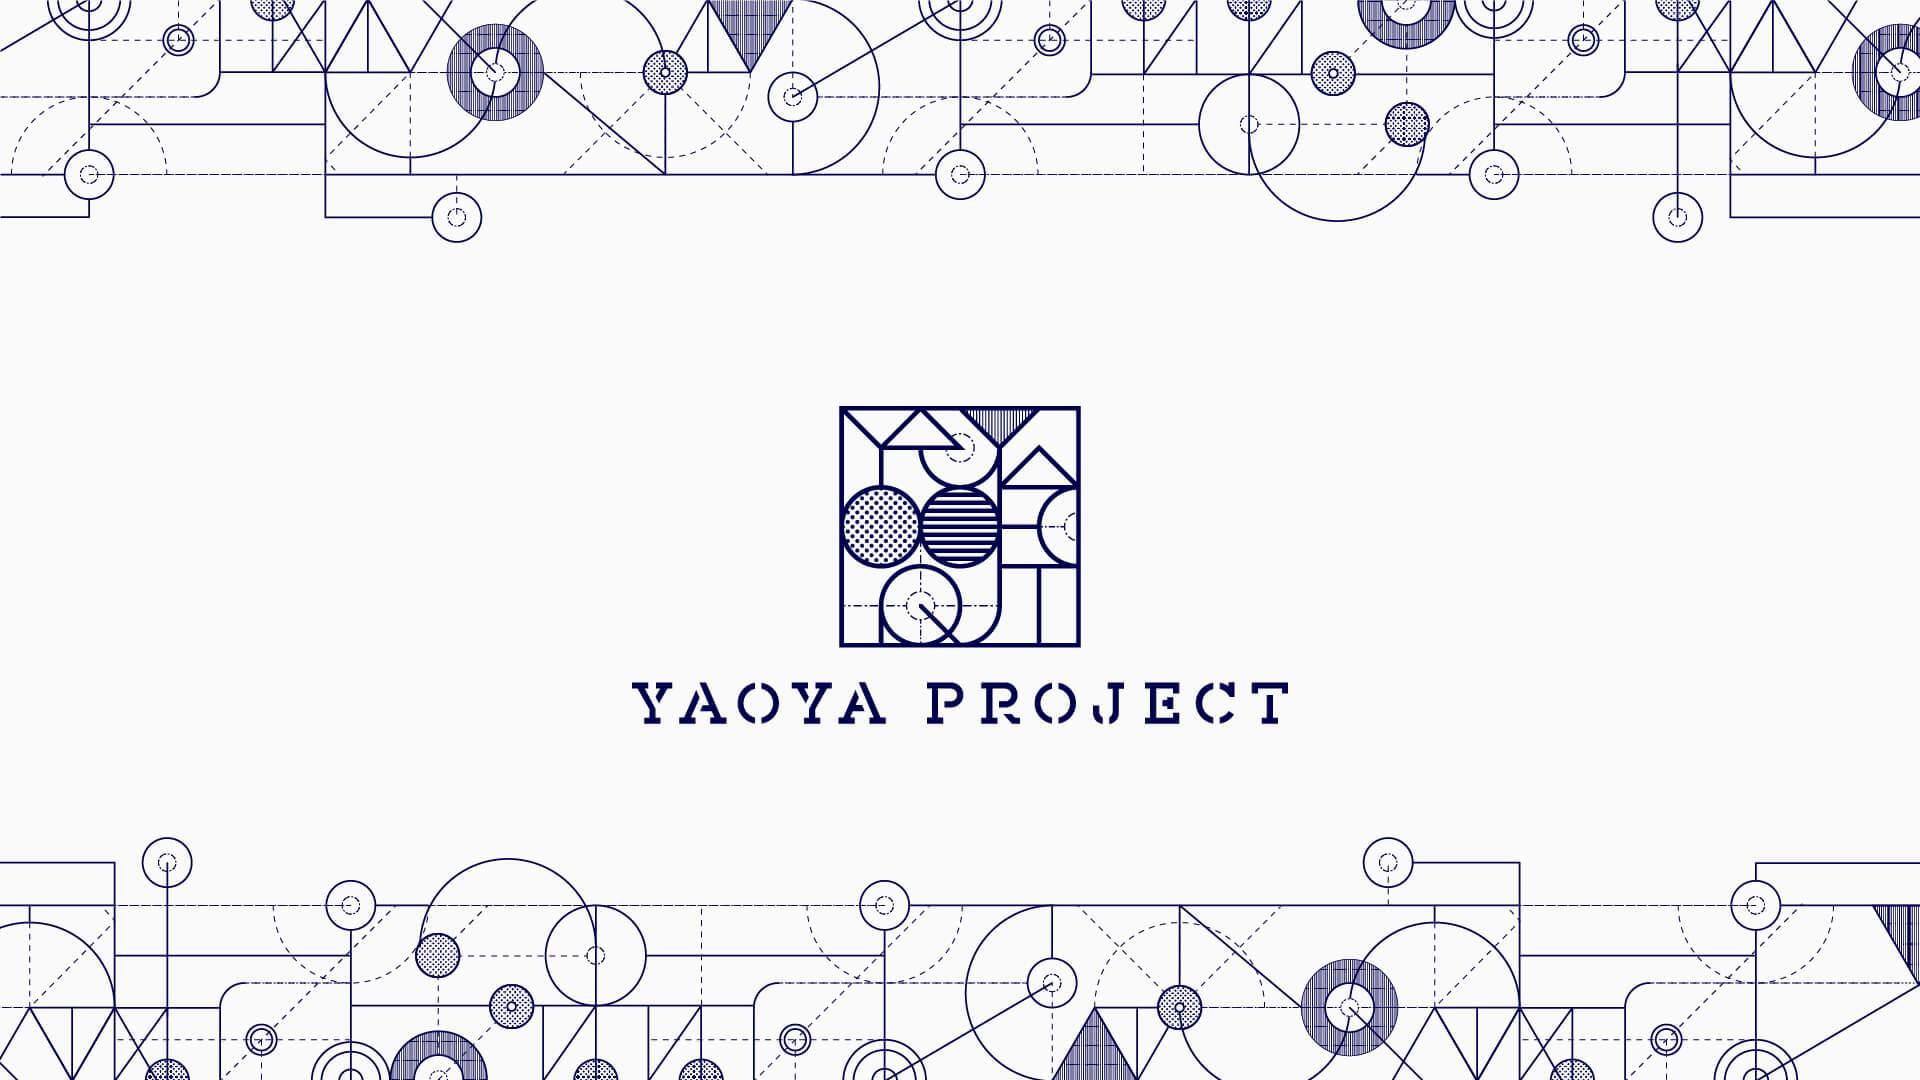 YAOYA PROJECT 2020に参加いたします